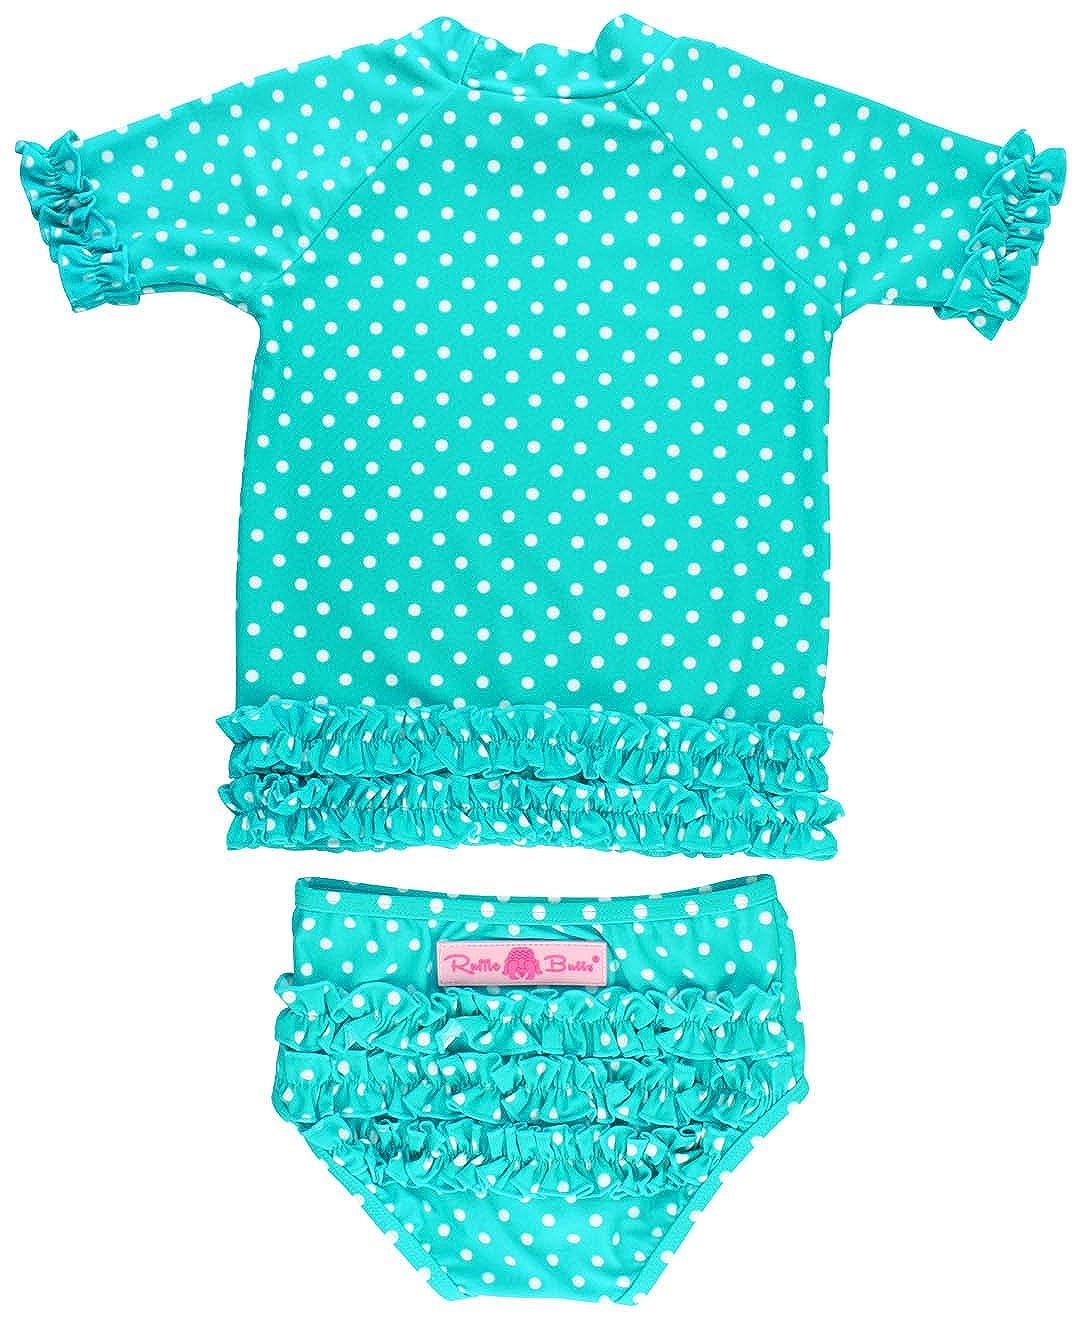 Sun Protection RGSYYXX-SSPK-SC-BABY Polka Dot Bikini with UPF 50 RuffleButts Baby//Toddler Girls Rash Guard 2-Piece Swimsuit Set